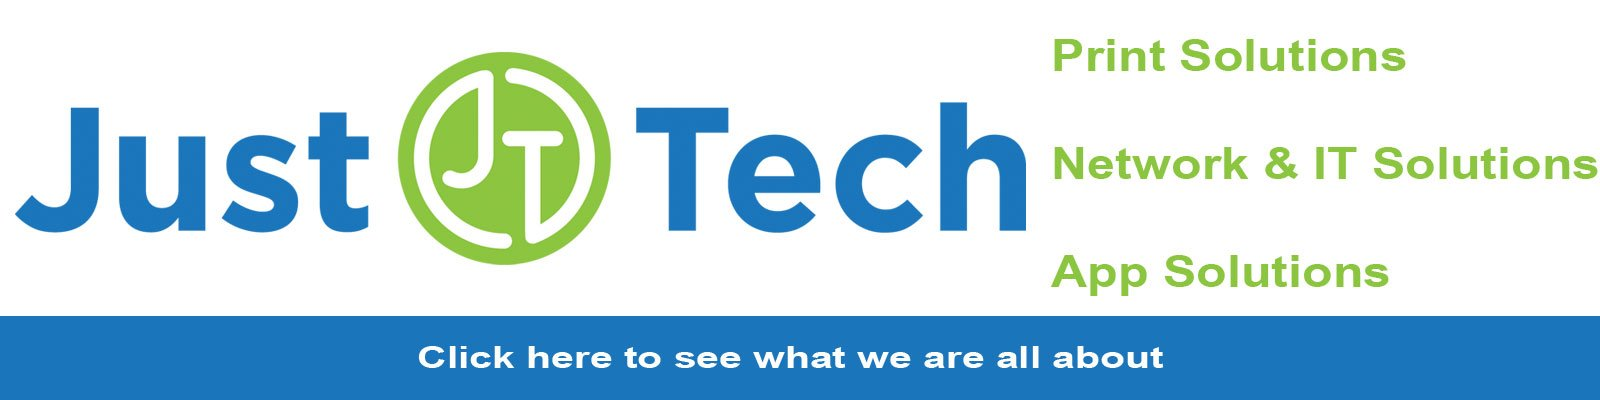 justtech-Solutionsv2